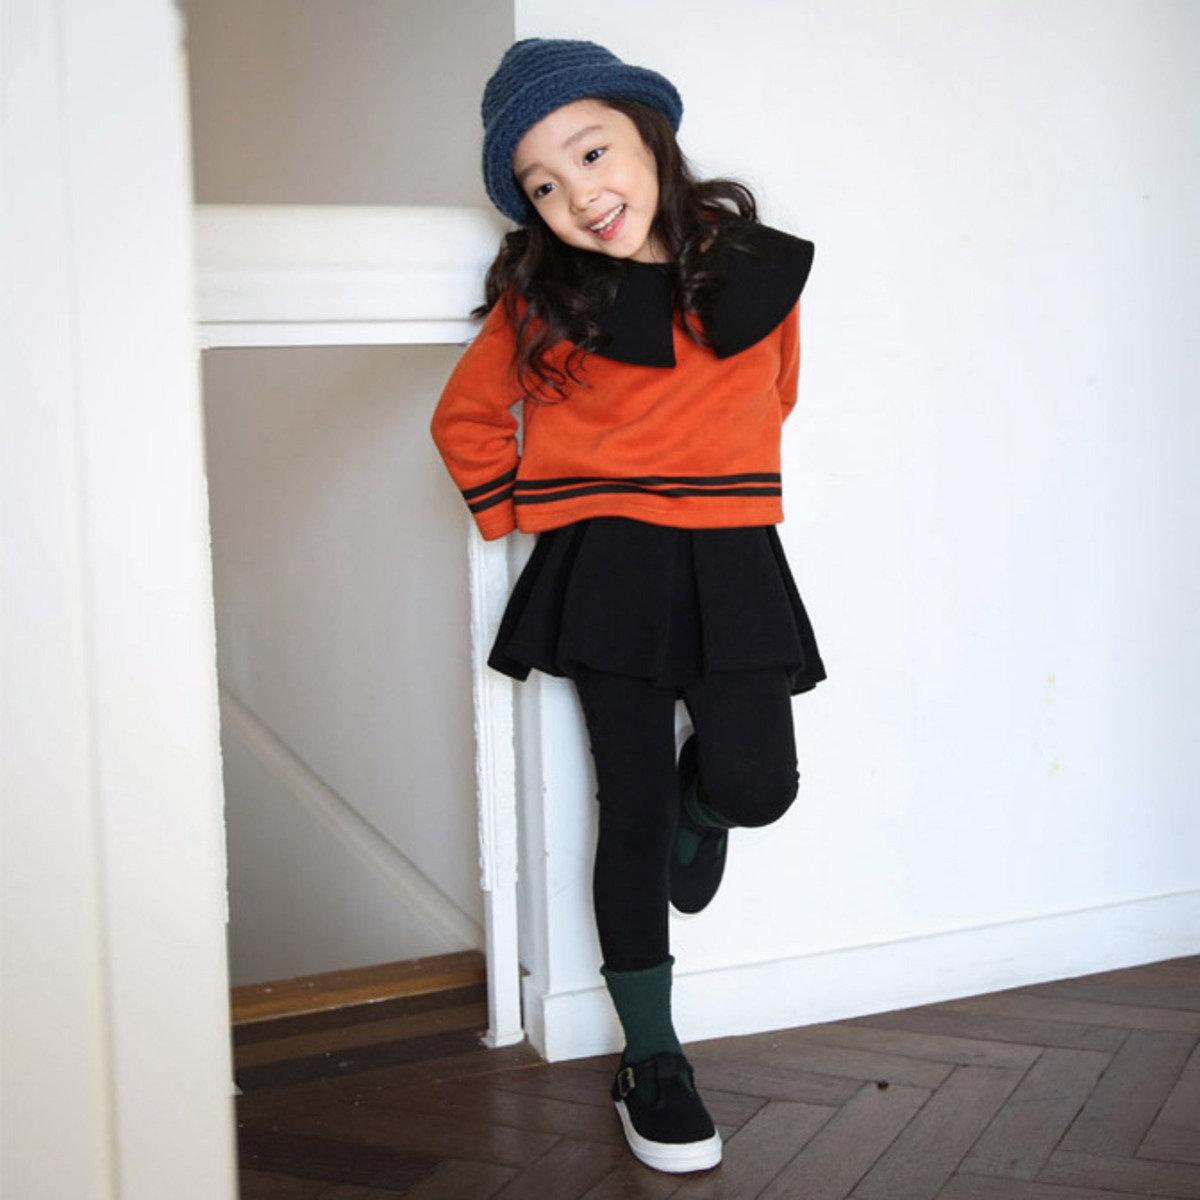 [15 W] 迷你裙款緊身褲_S60263